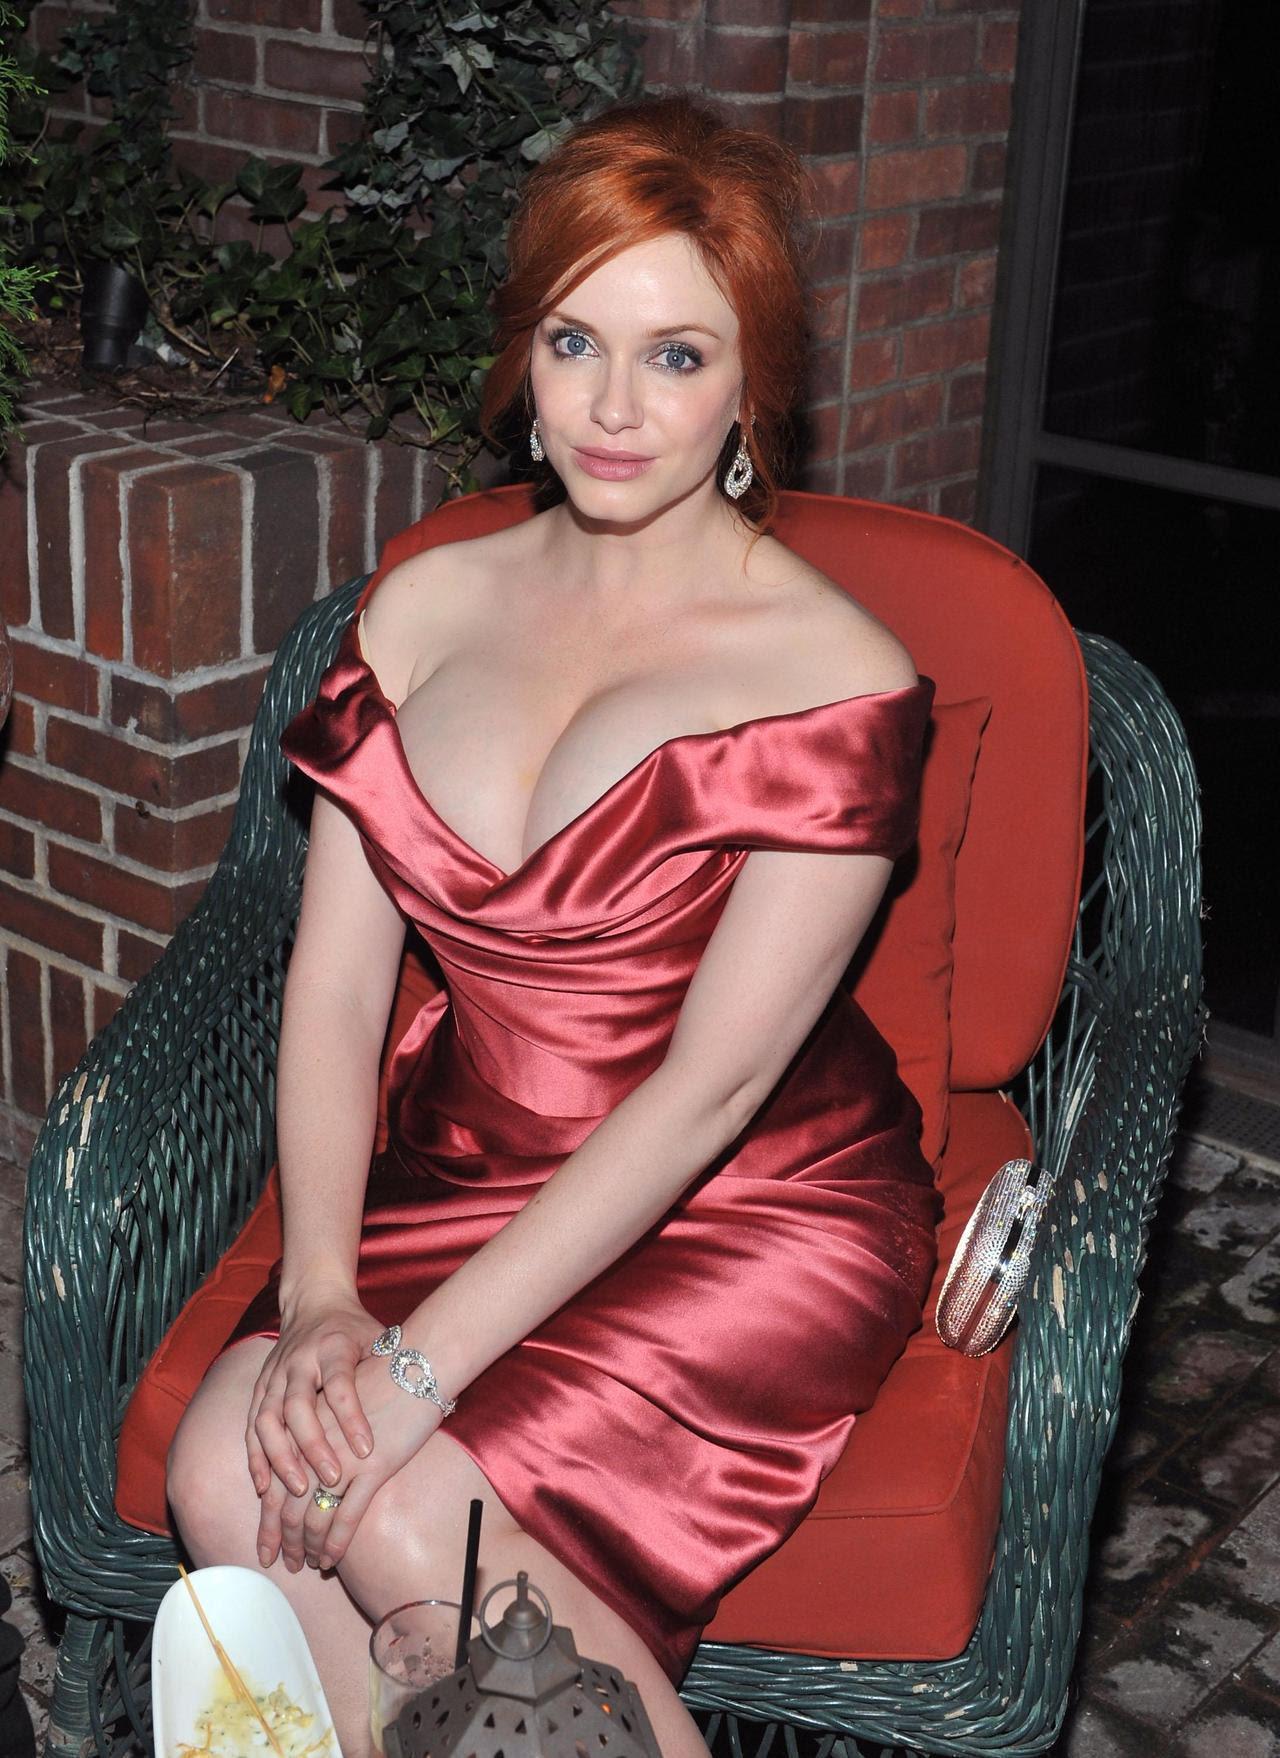 Naked photos of julia roberts Hentai Anatomy